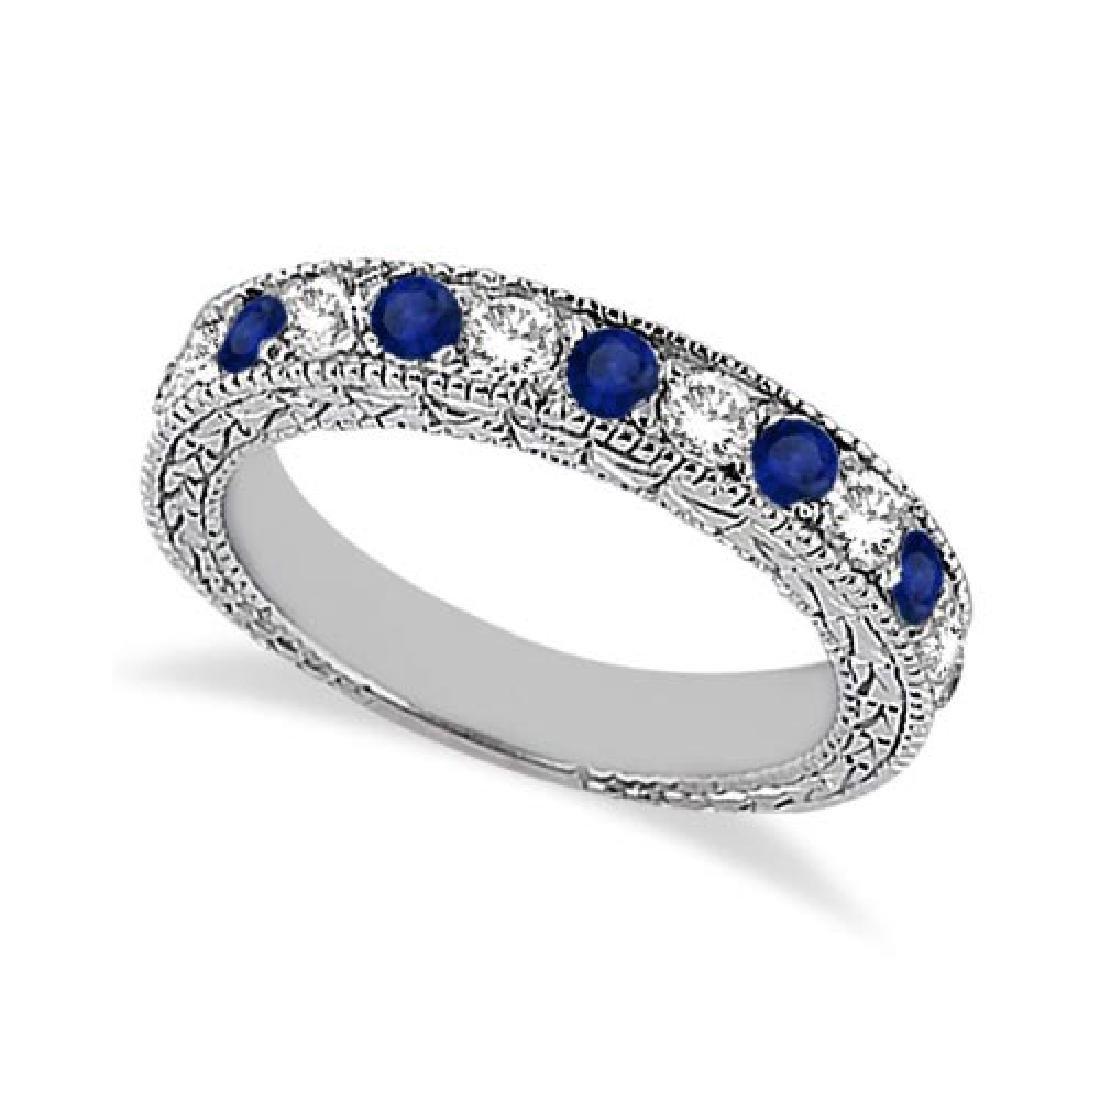 Antique Diamond and Blue Sapphire Wedding Ring Platinum